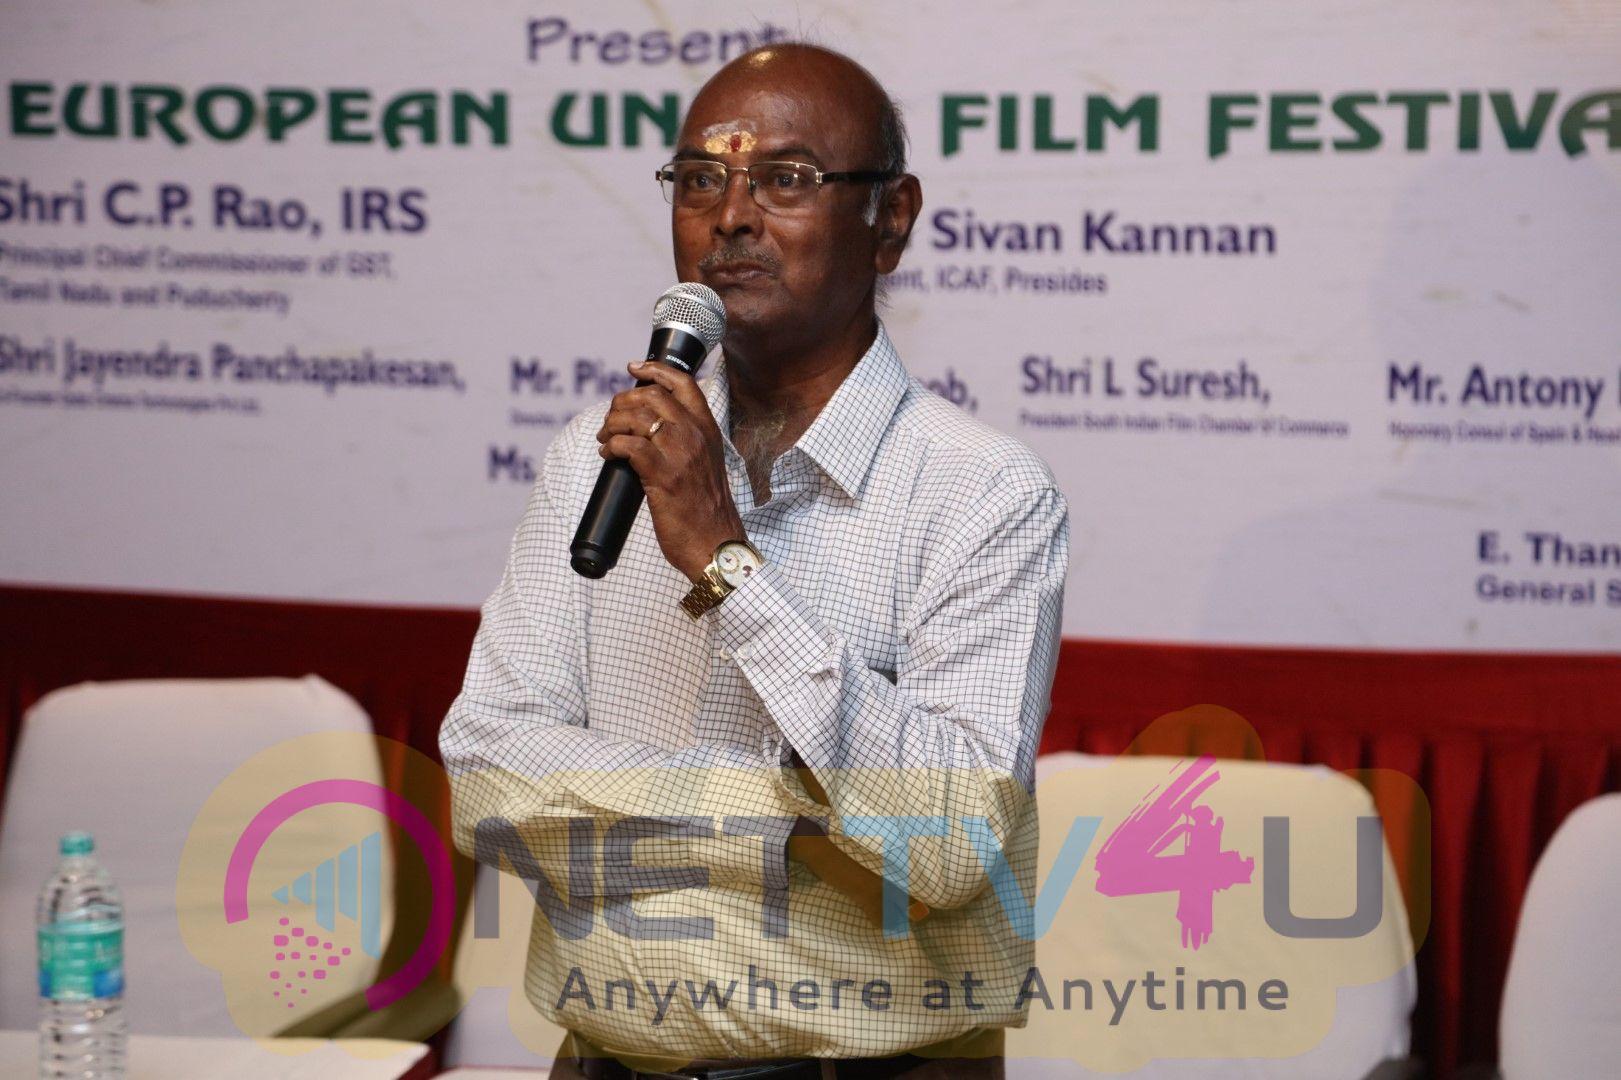 European Union Film Festival Inauguration Function Stills